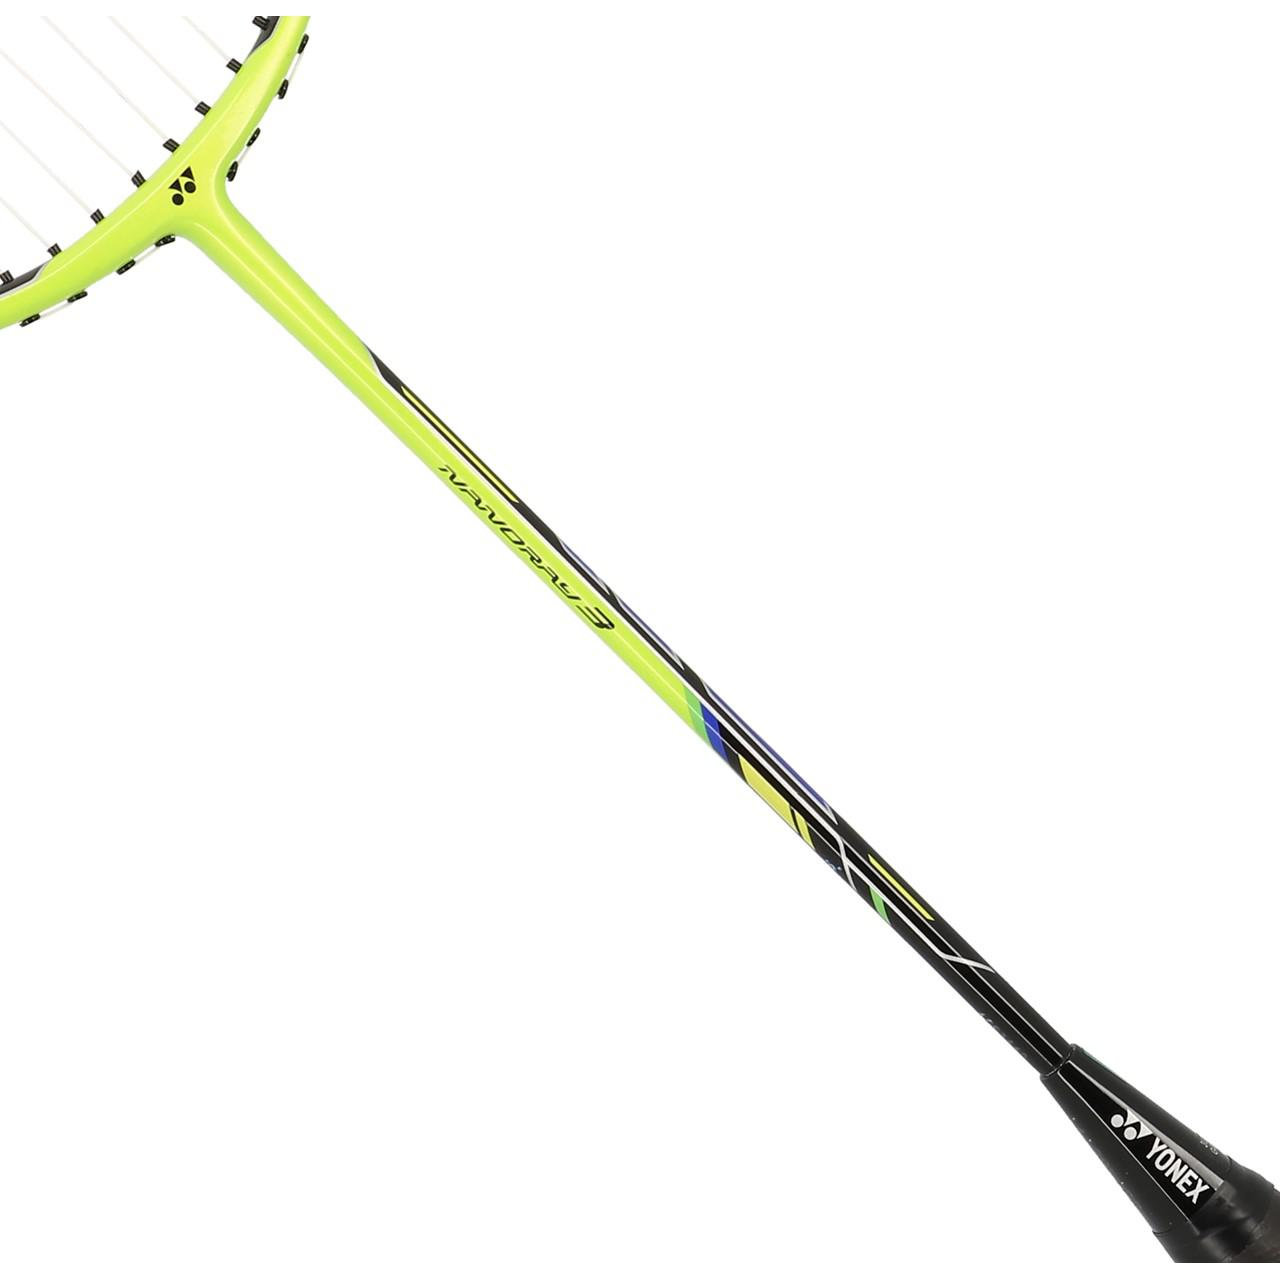 Badminton-Racket-Yonex-Nanoray-3-3u4-Lime-Badminton-Yellow-91913-New thumbnail 4